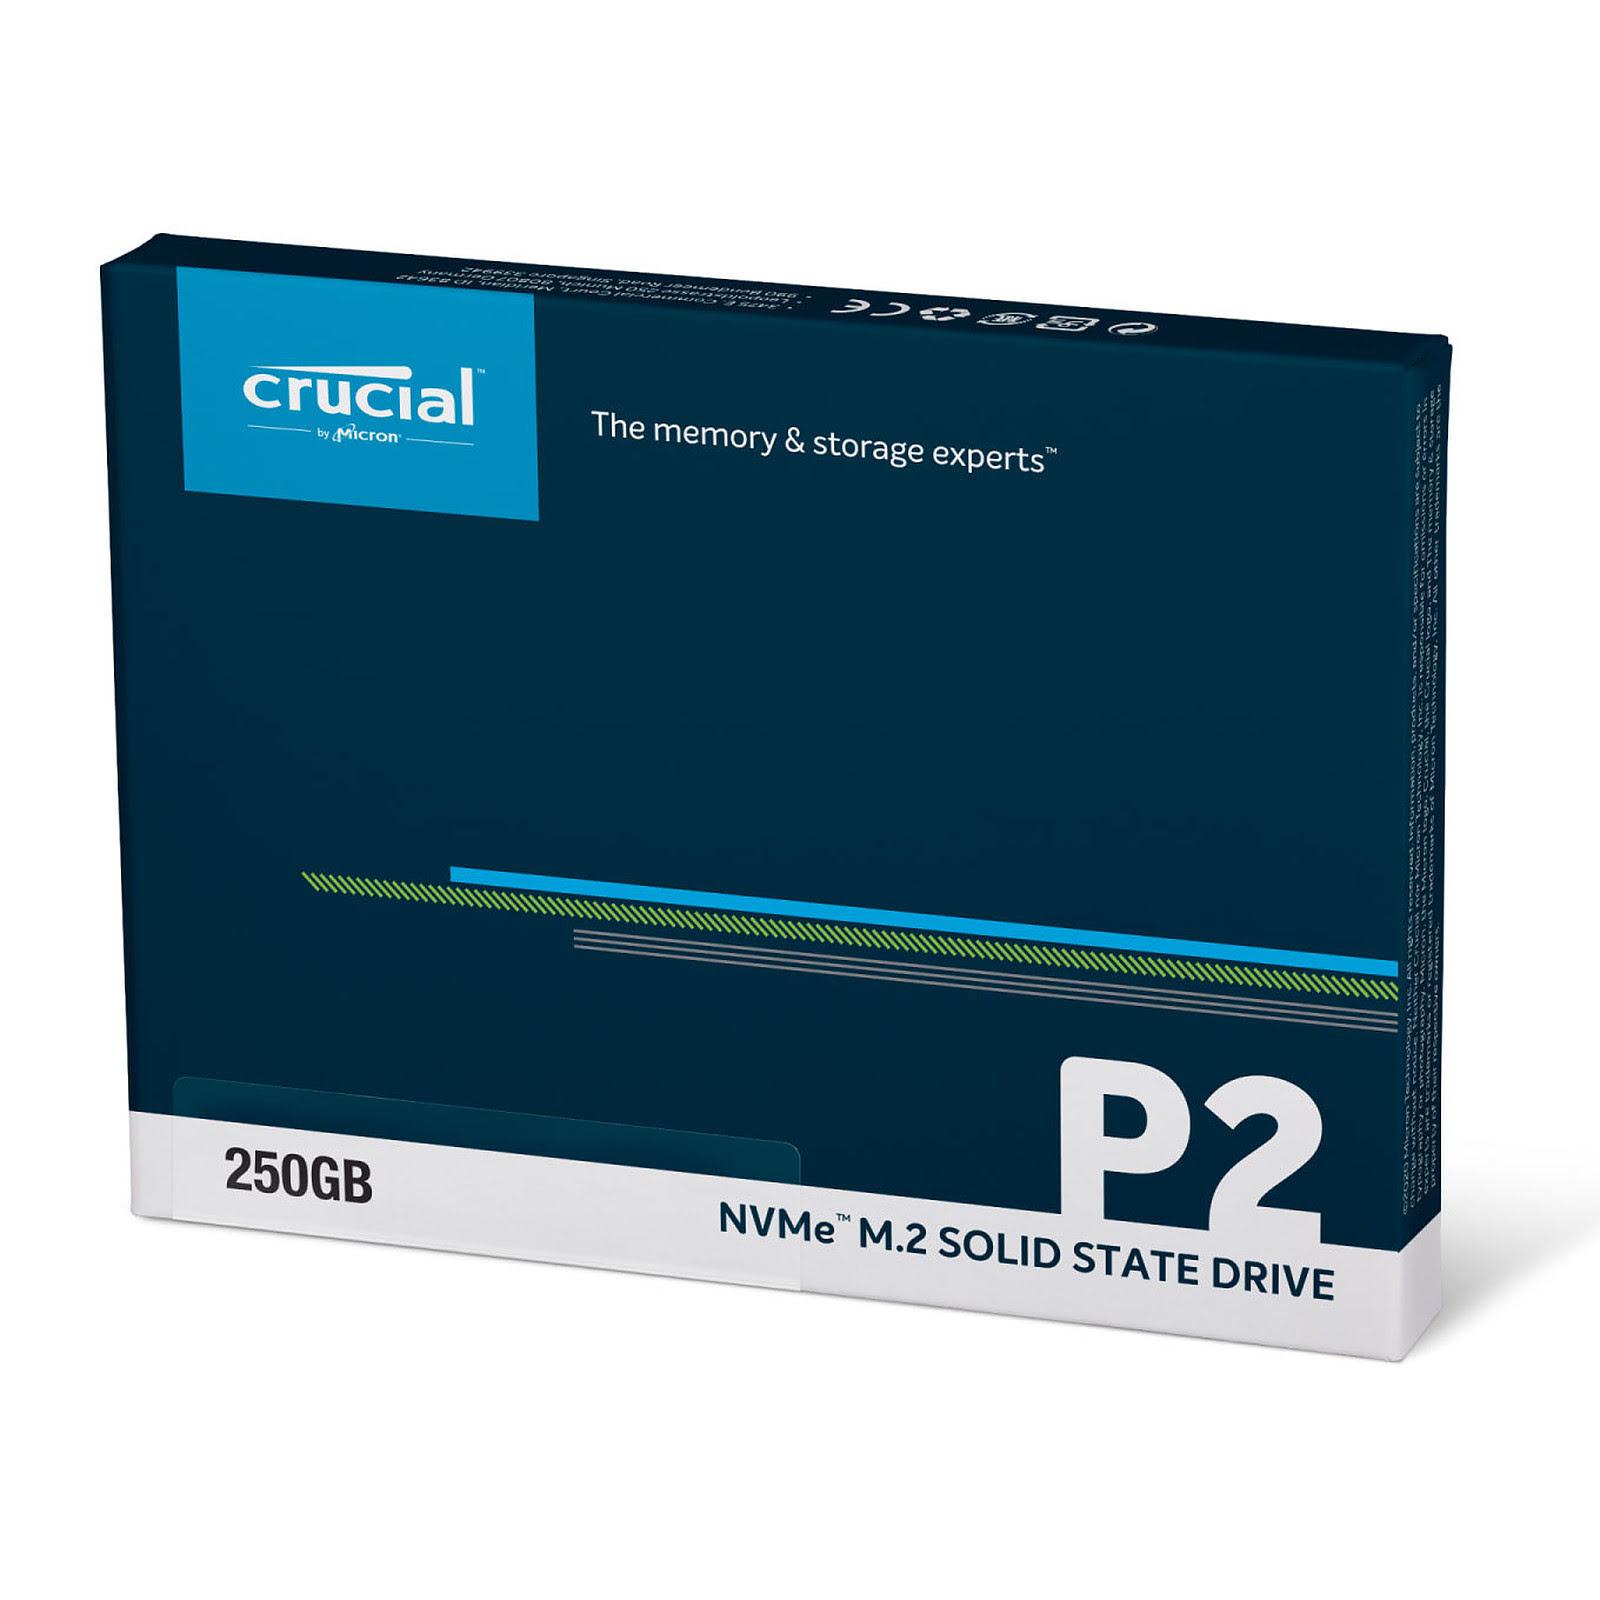 Crucial P2 240-275Go M.2 - Disque SSD Crucial - Cybertek.fr - 2